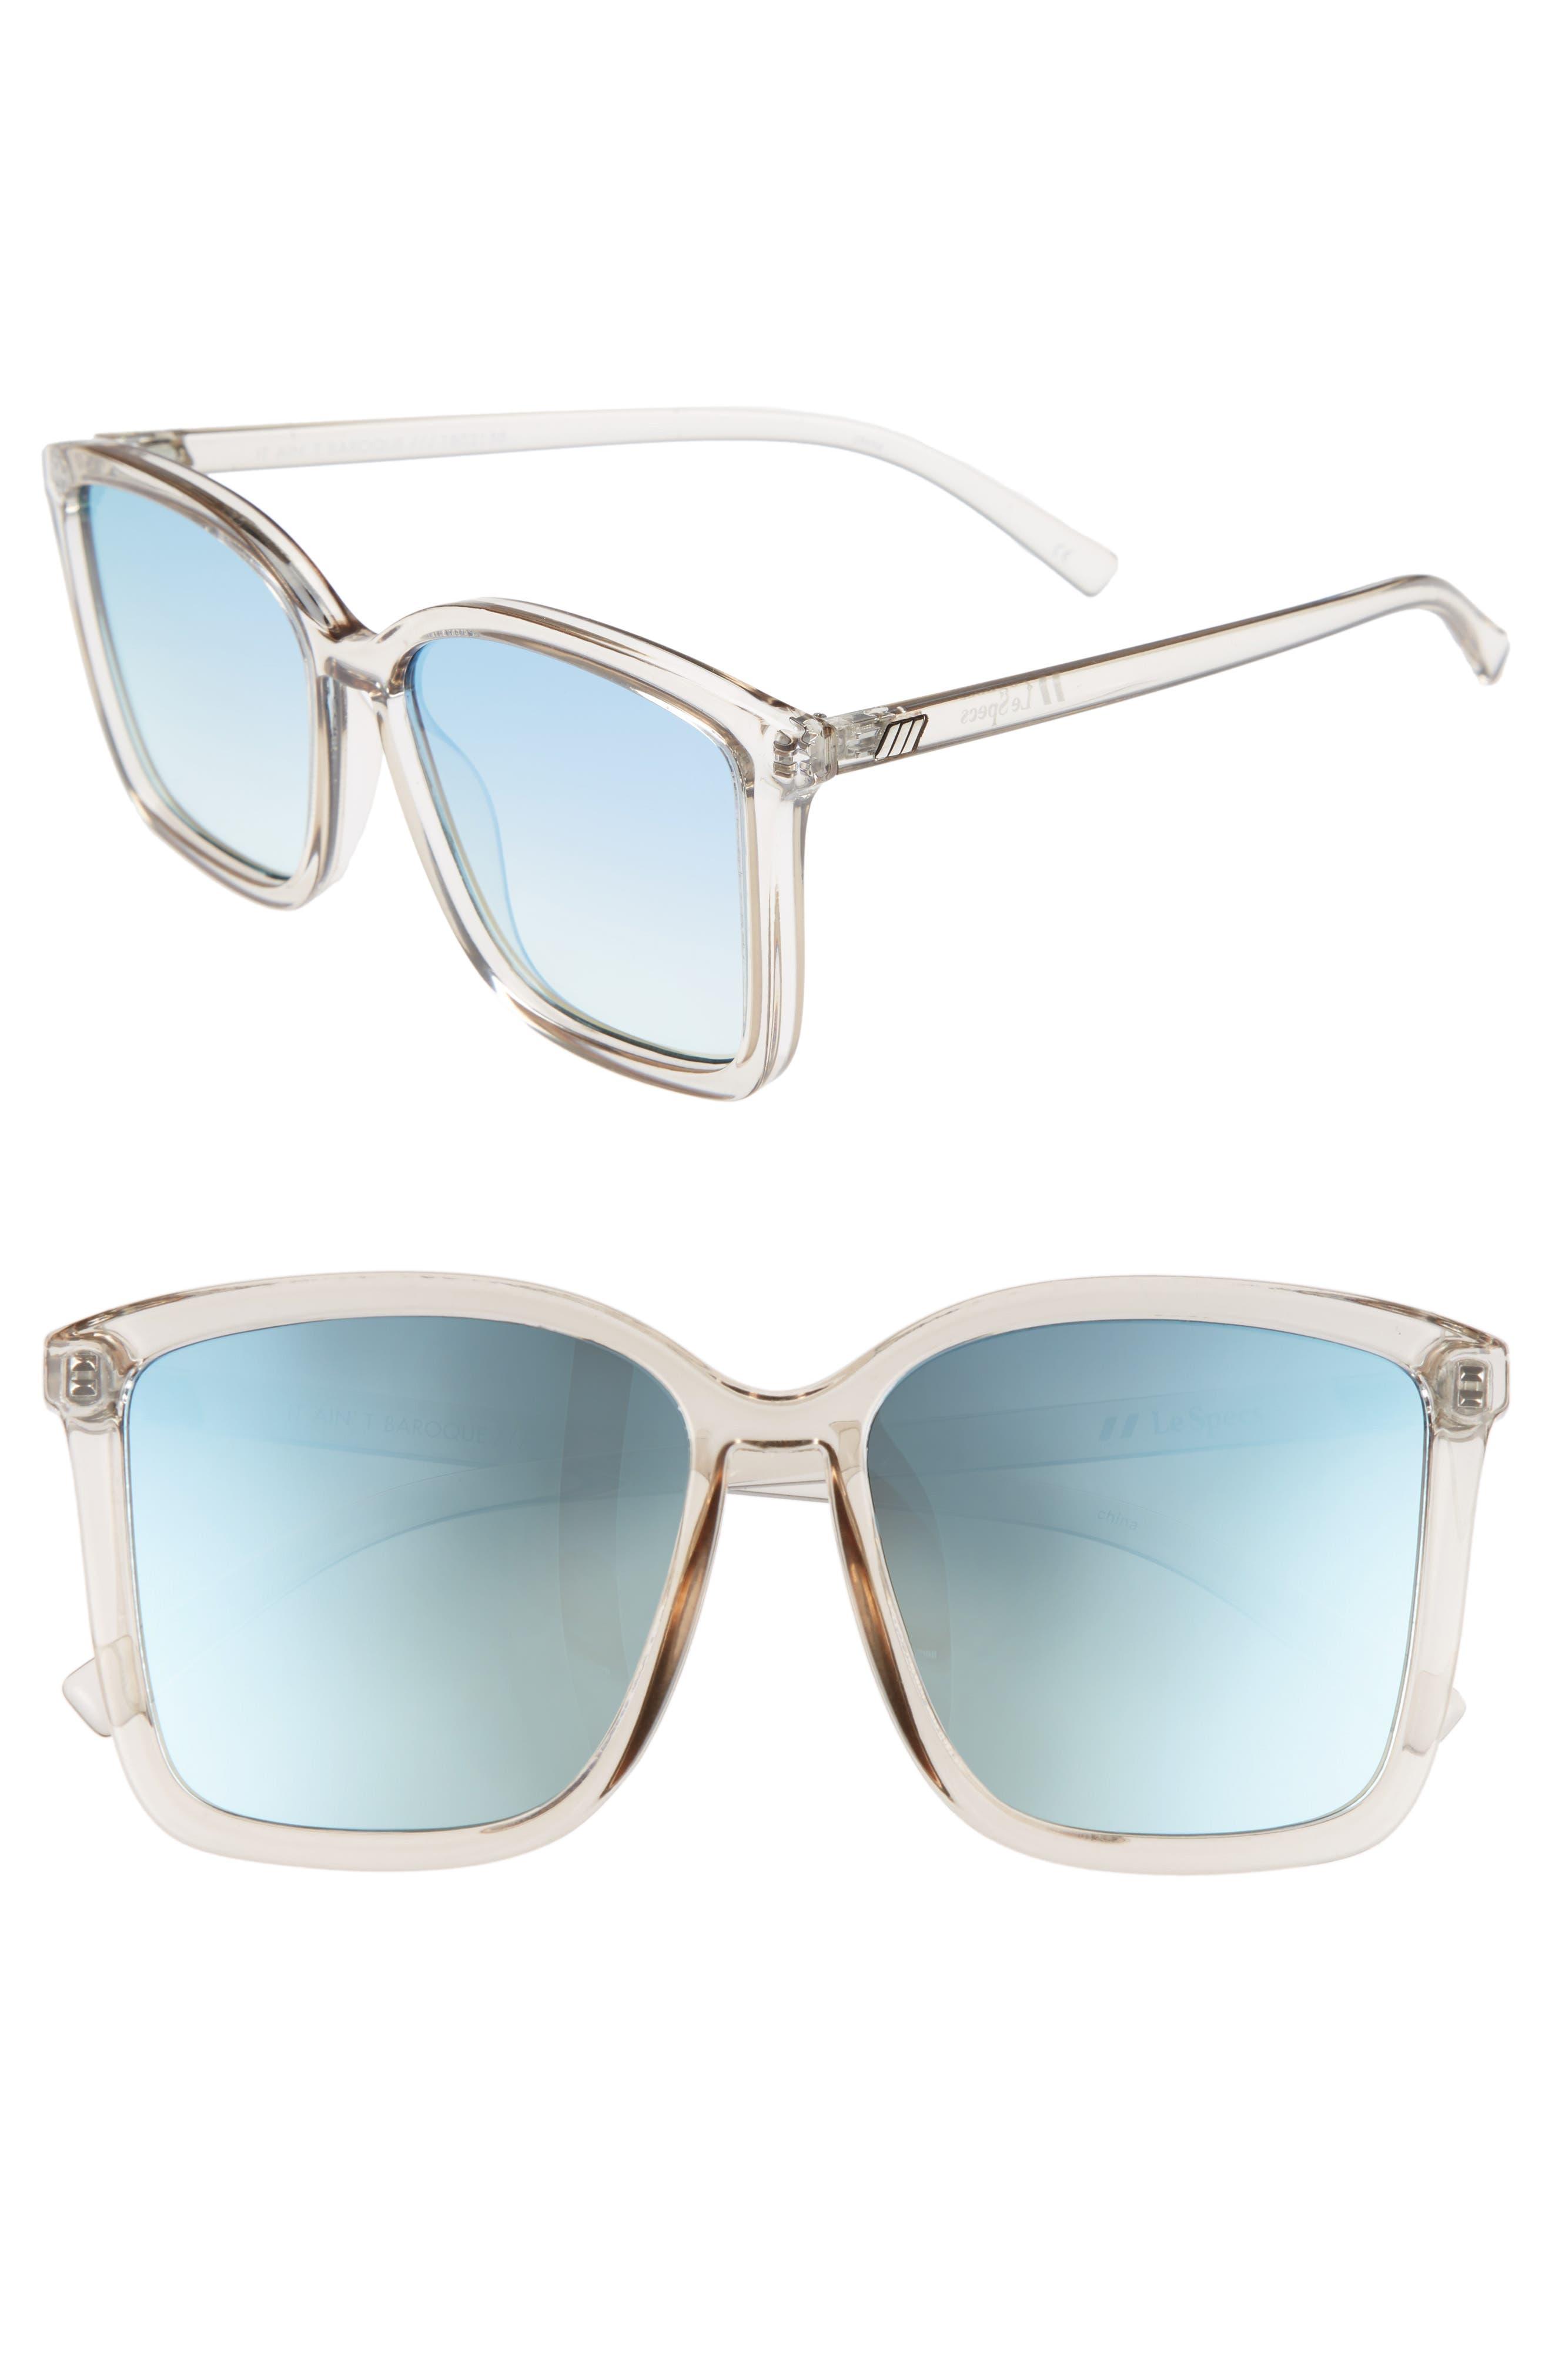 It Ain't Baroque 55mm Sunglasses,                             Main thumbnail 1, color,                             Shadow